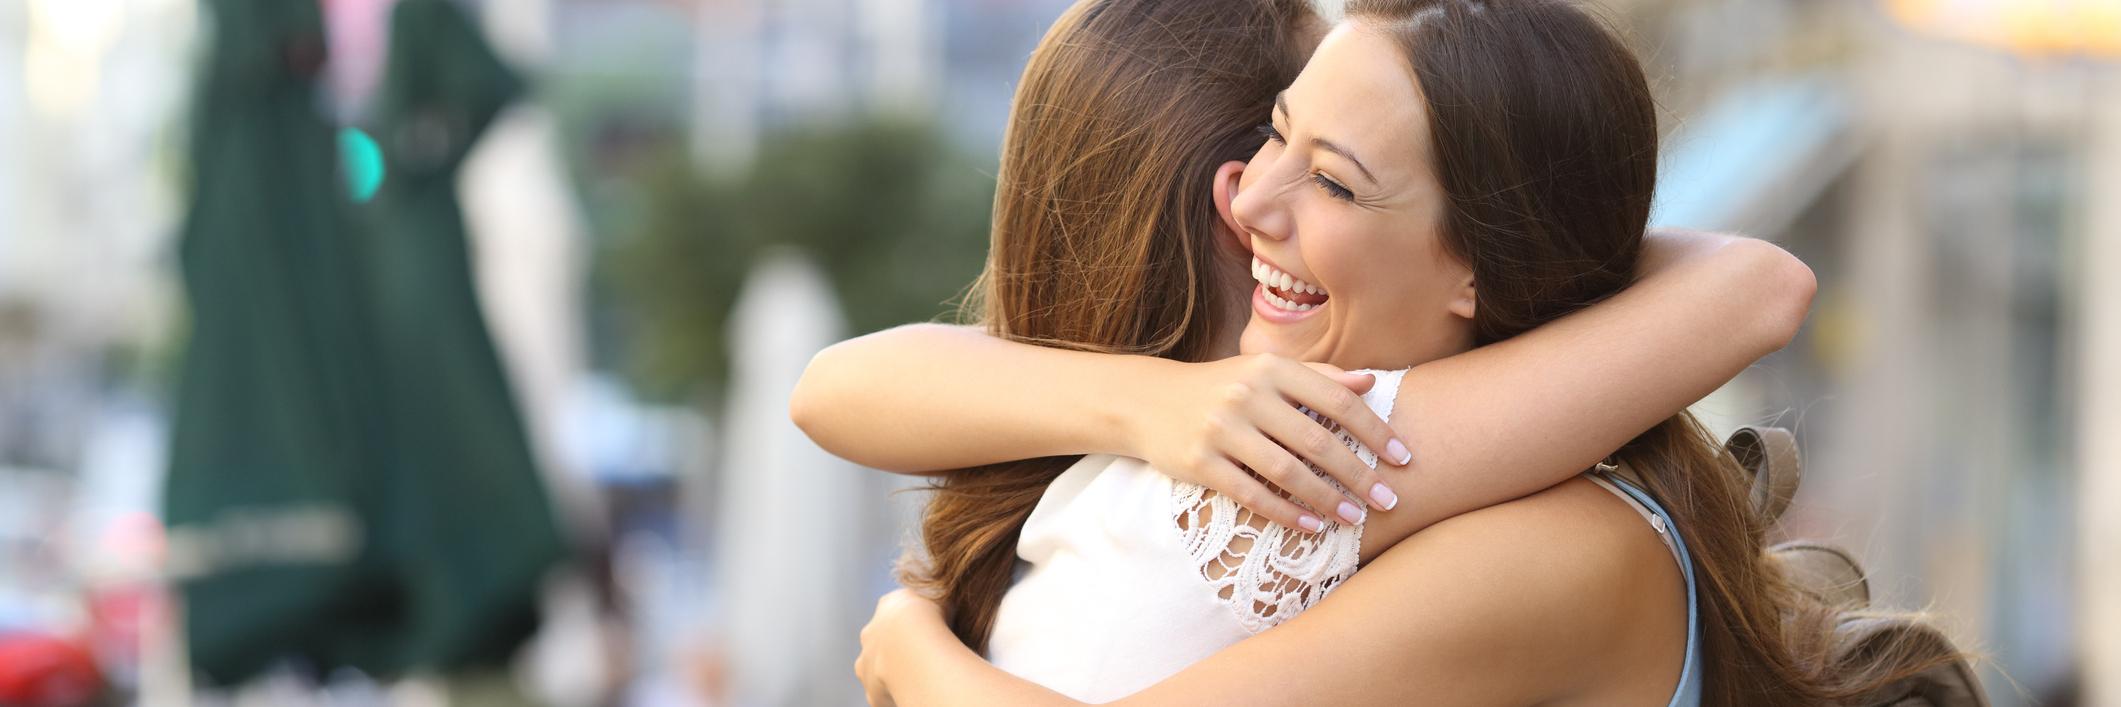 Two friends hugging outside.